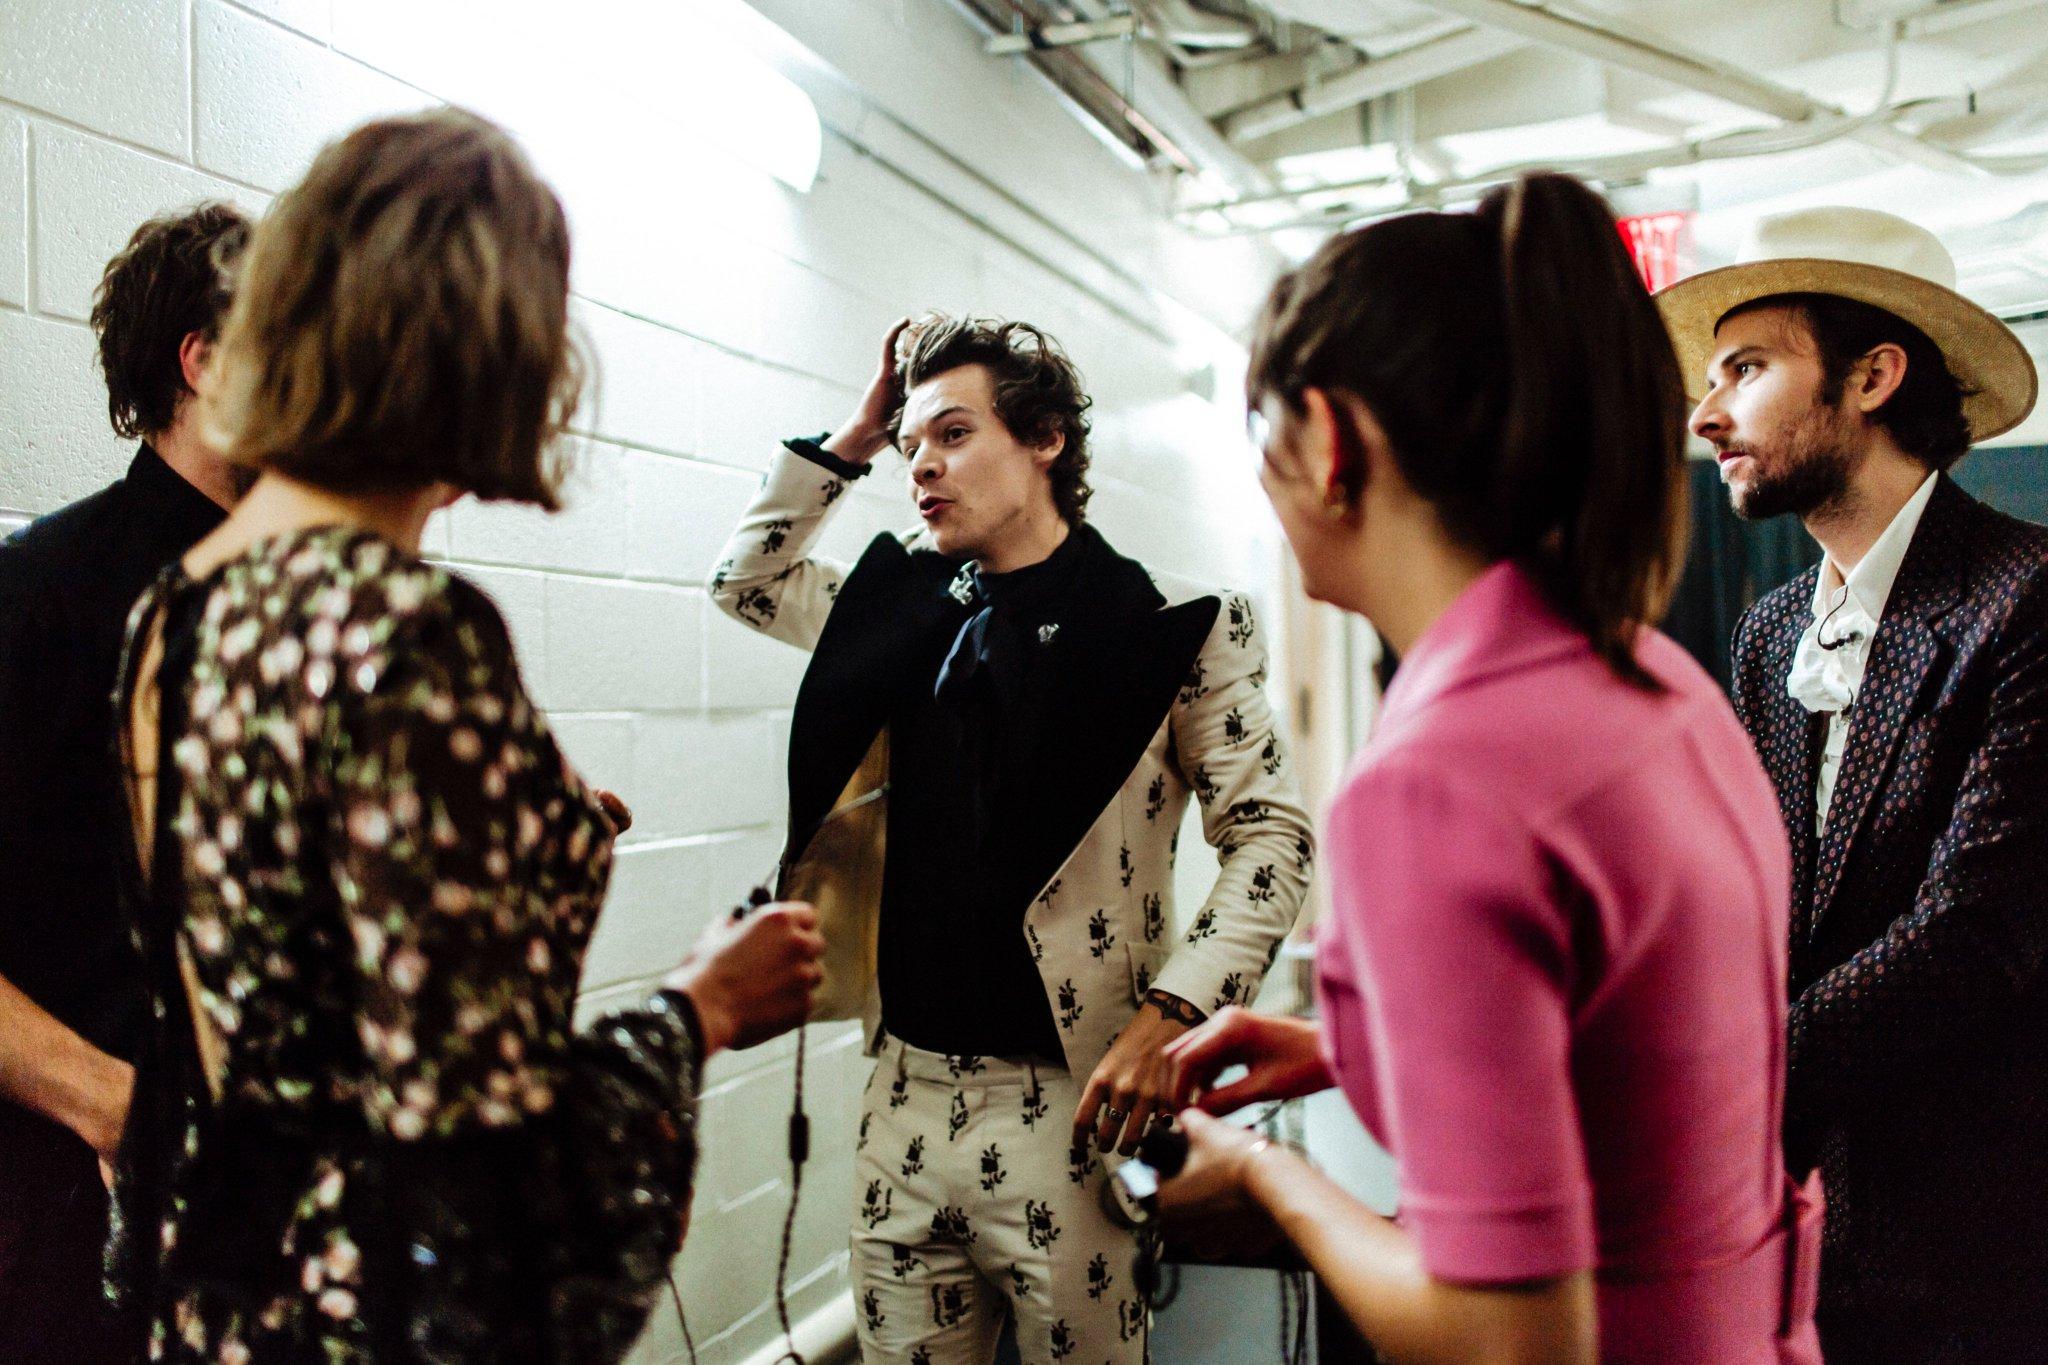 Harry Styles // Live On Tour Night 47 // New York, NY 1/2 21.06.18 https://t.co/HIcjHsQC2B